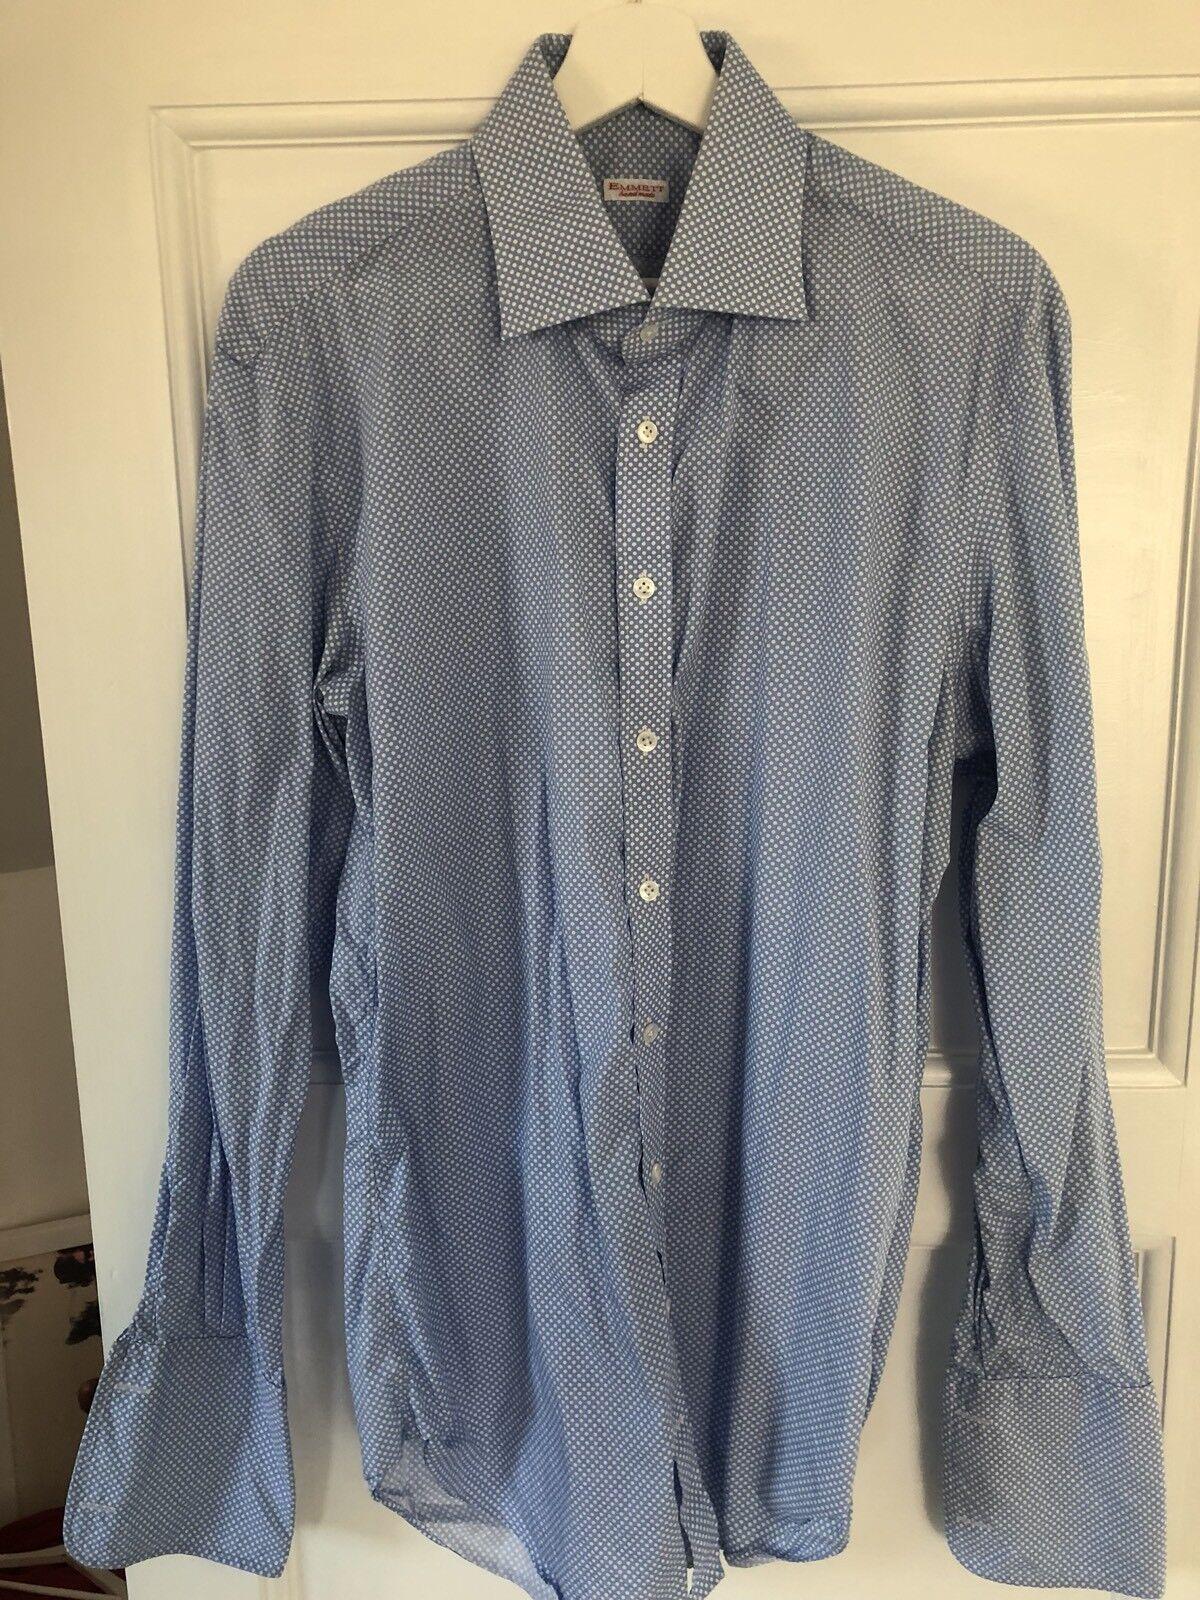 "Emmett Bespoke Mens Slim Fit Double Cuff Shirt (16.5"")"